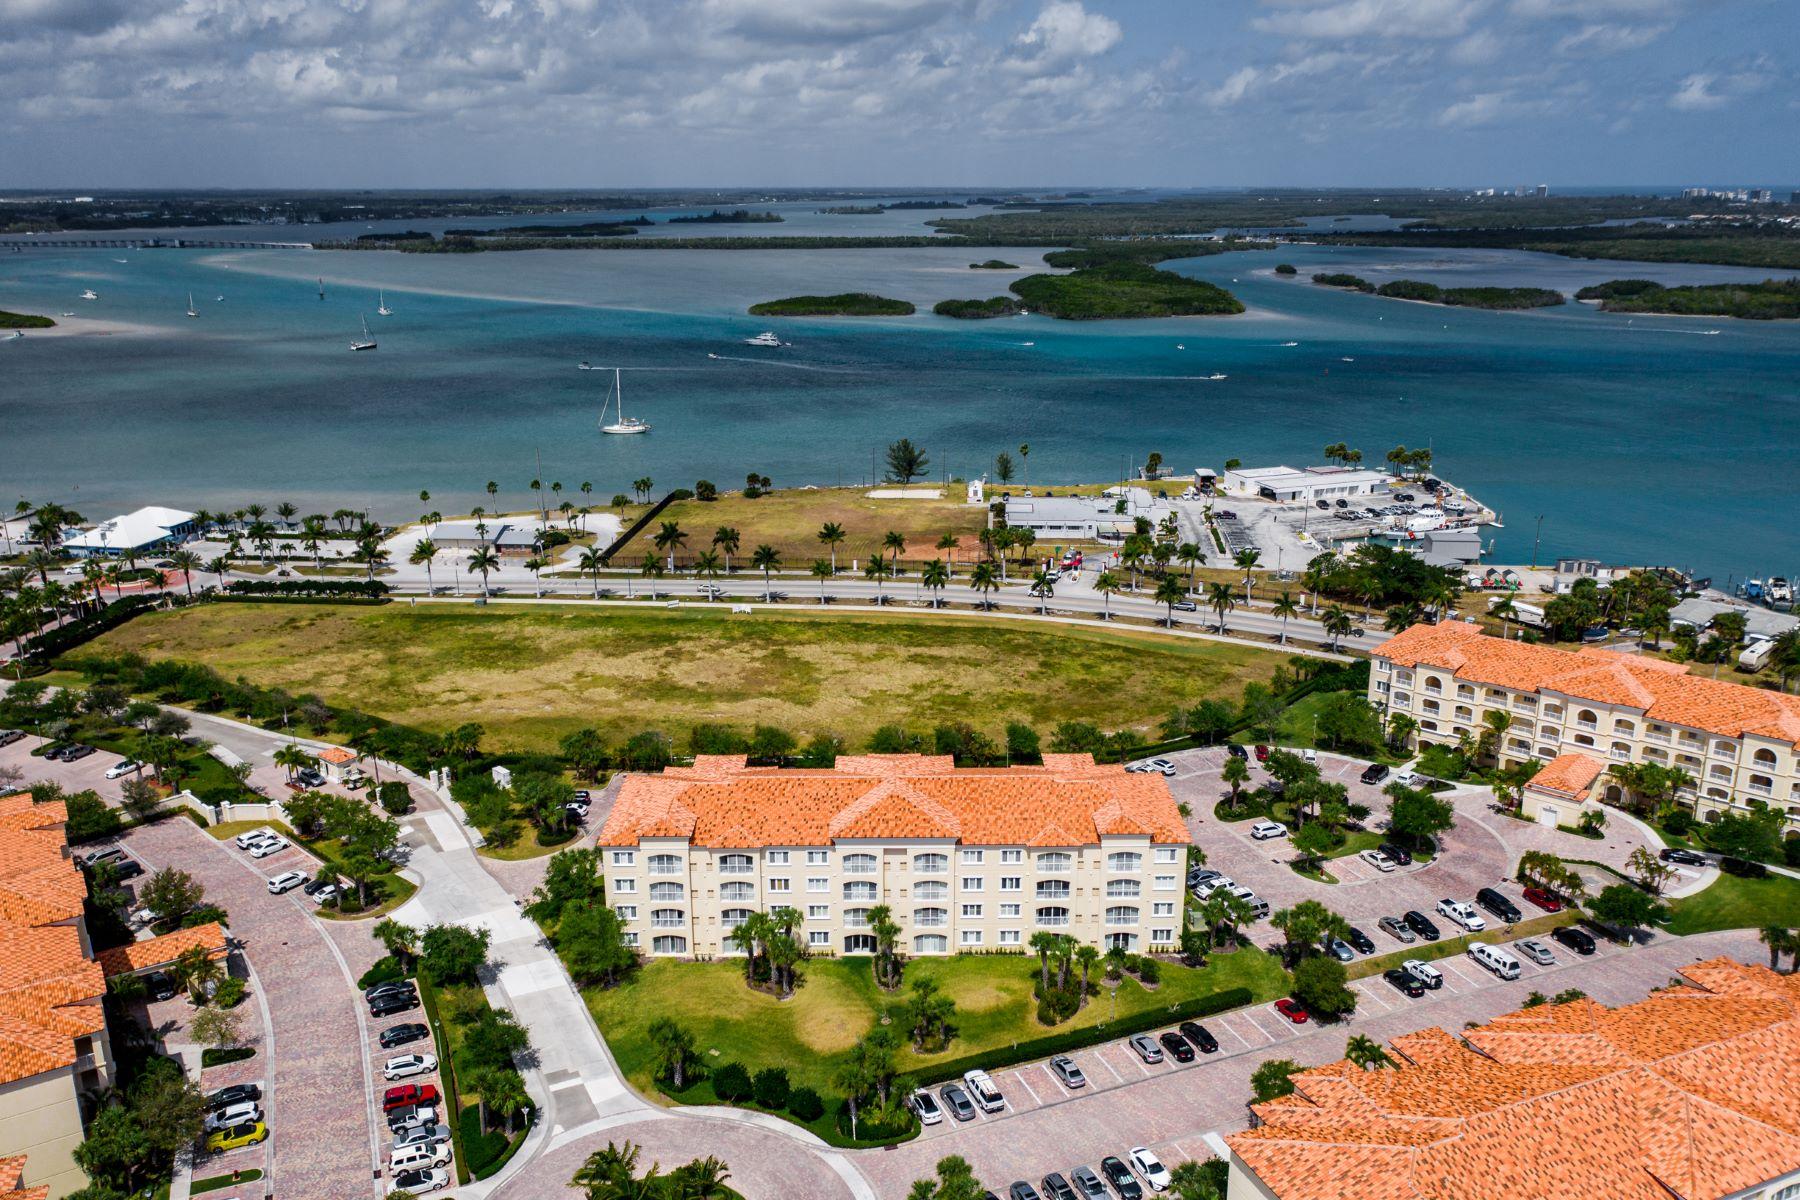 37 Harbour Isle Drive 37 Harbour Isle Drive 203 Fort Pierce, Florida 34949 Förenta staterna